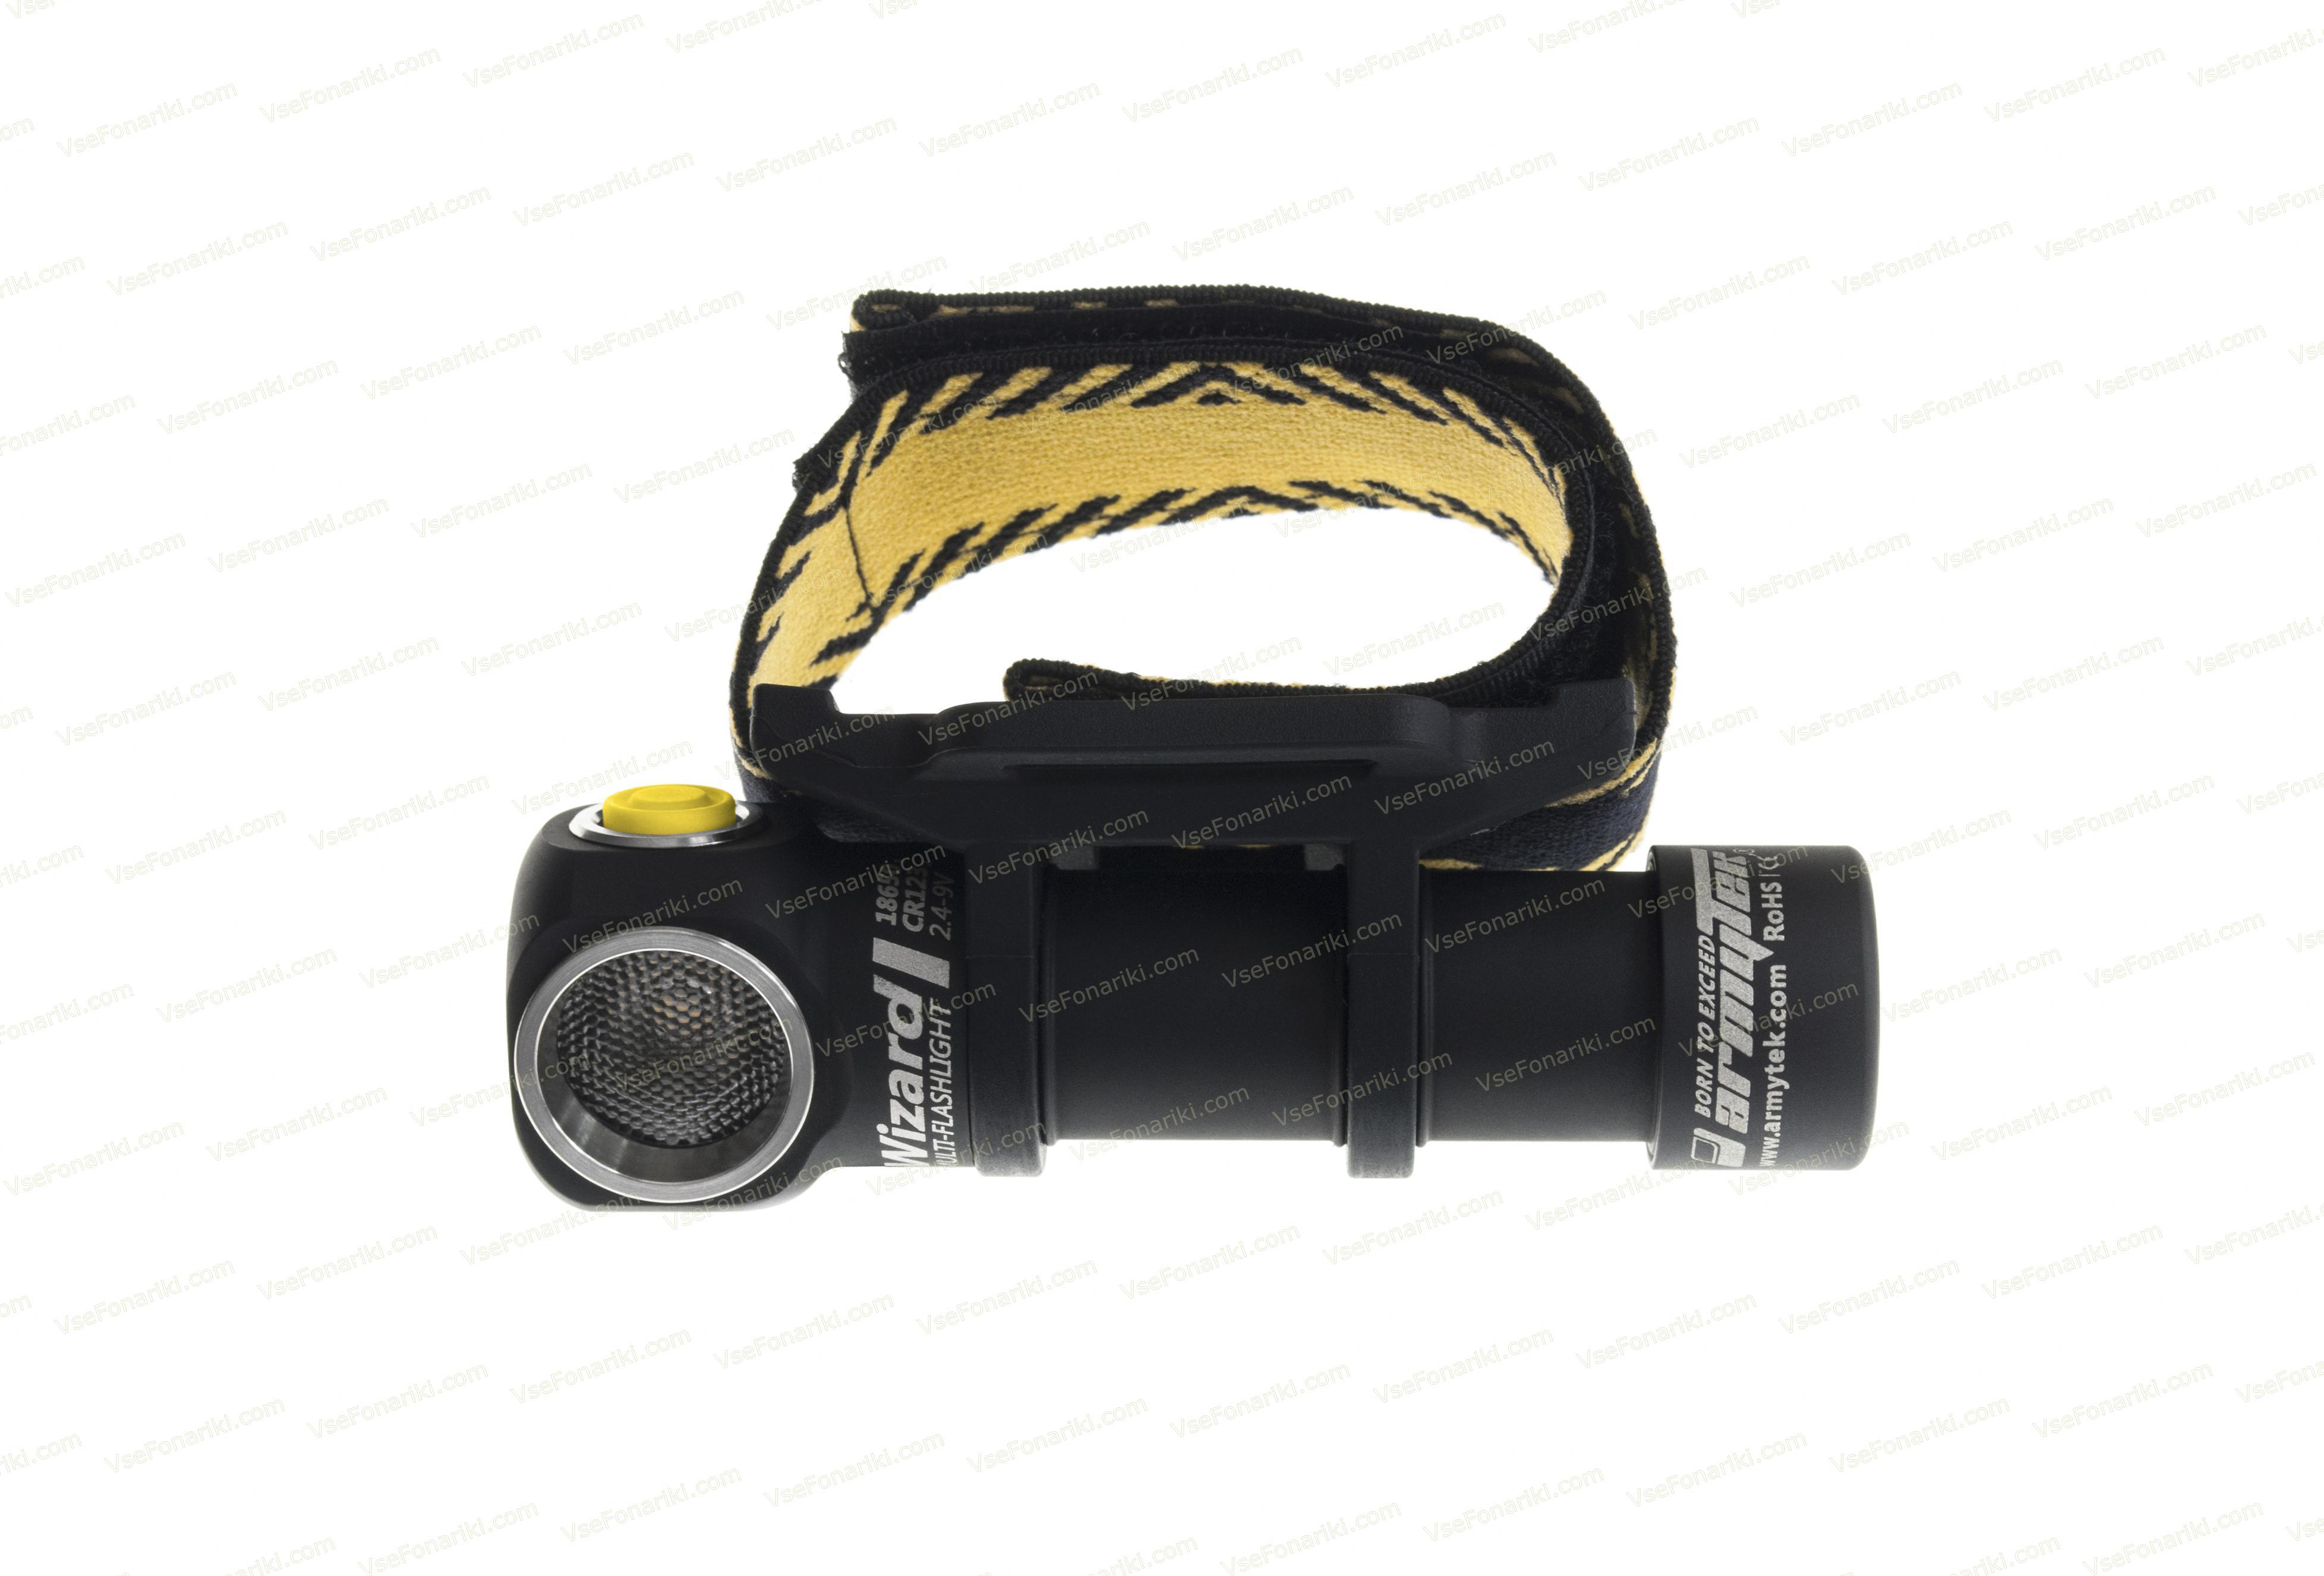 Фото 1 фонаря Armytek Wizard v3 Magnet USB